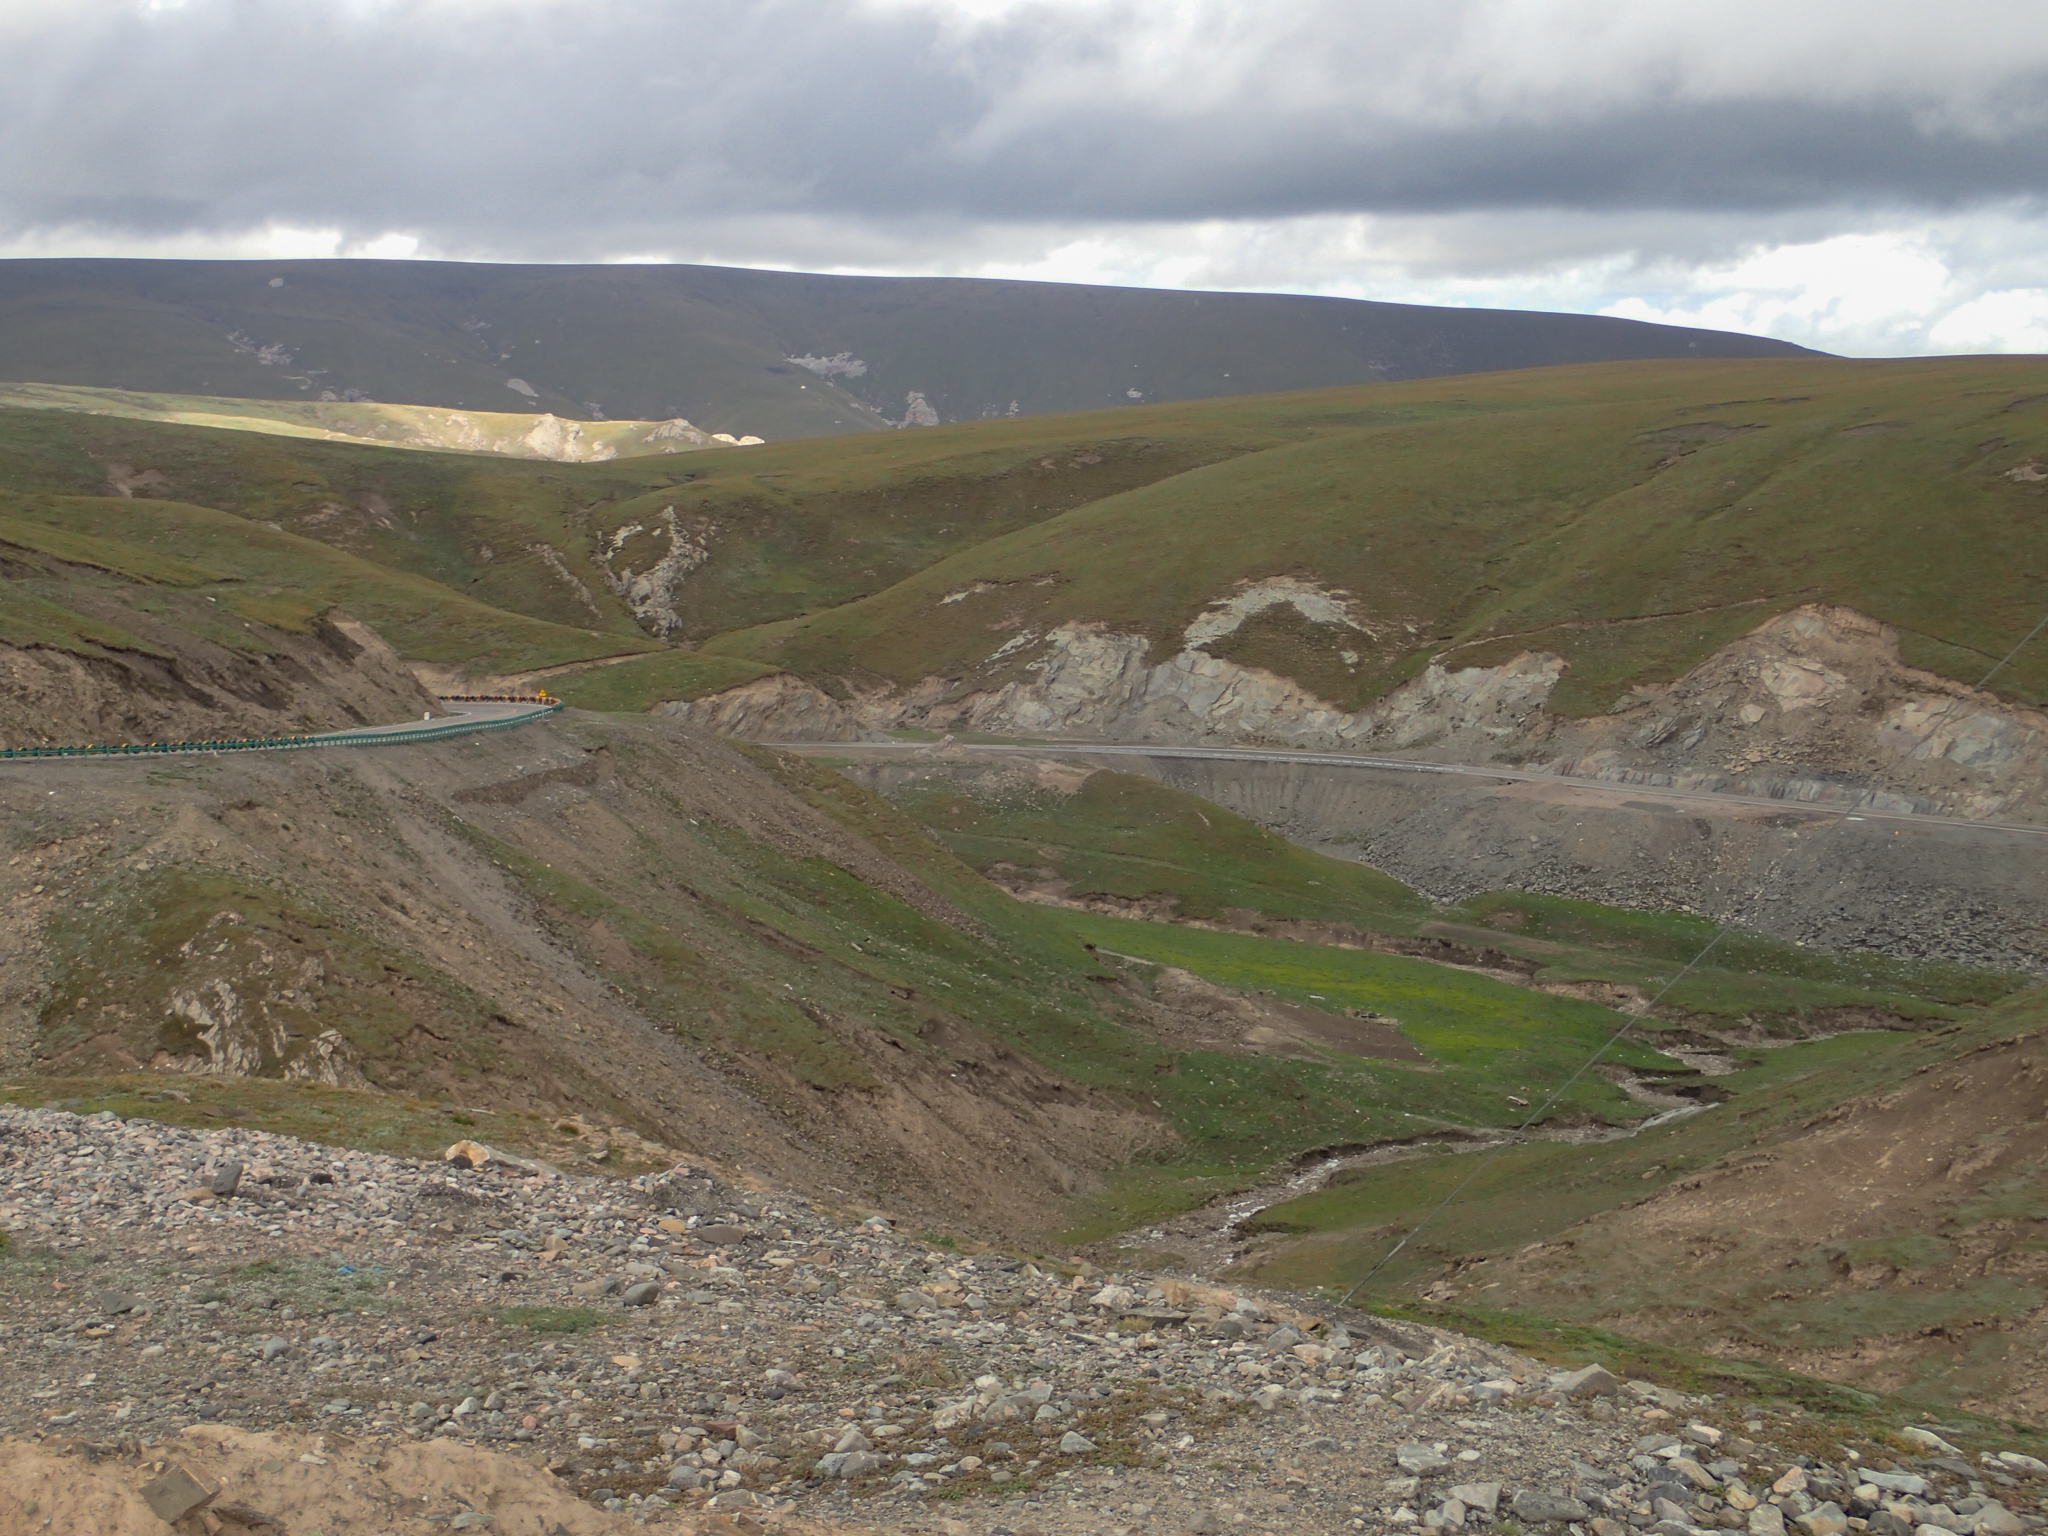 New roads through the hills